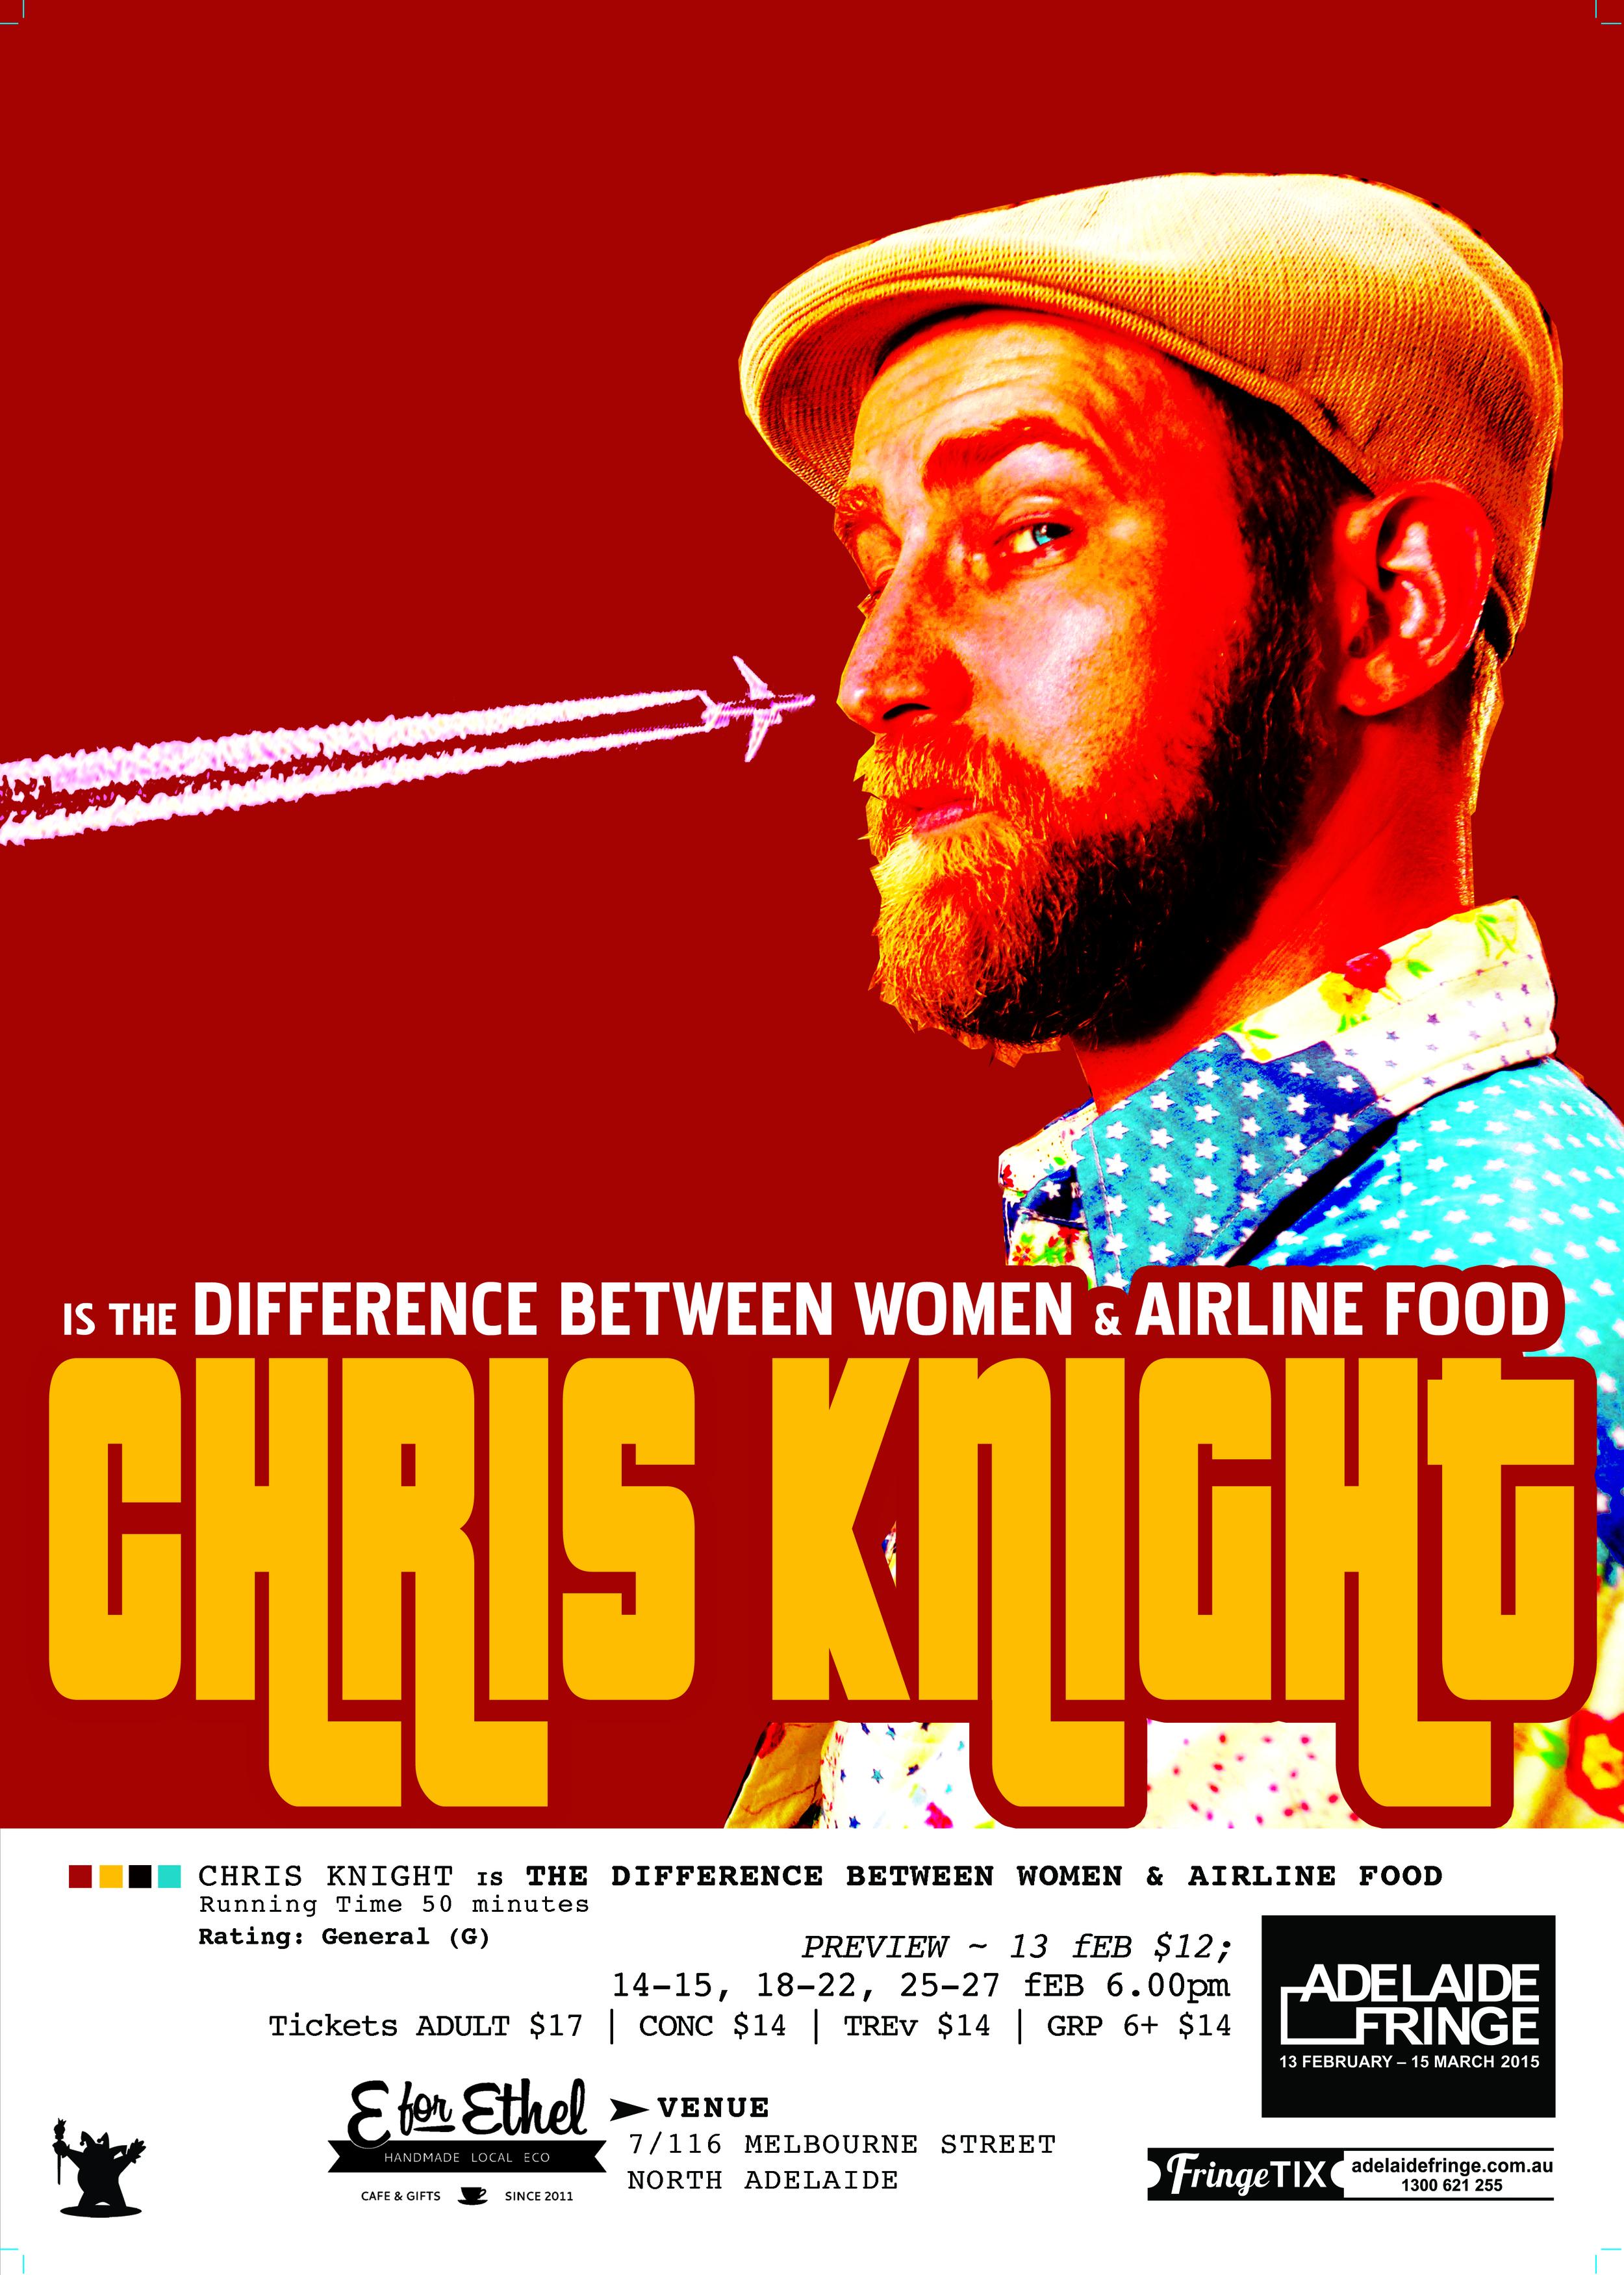 Chris_Knight_2015_POSTER_fixed_CMYK copy.jpg